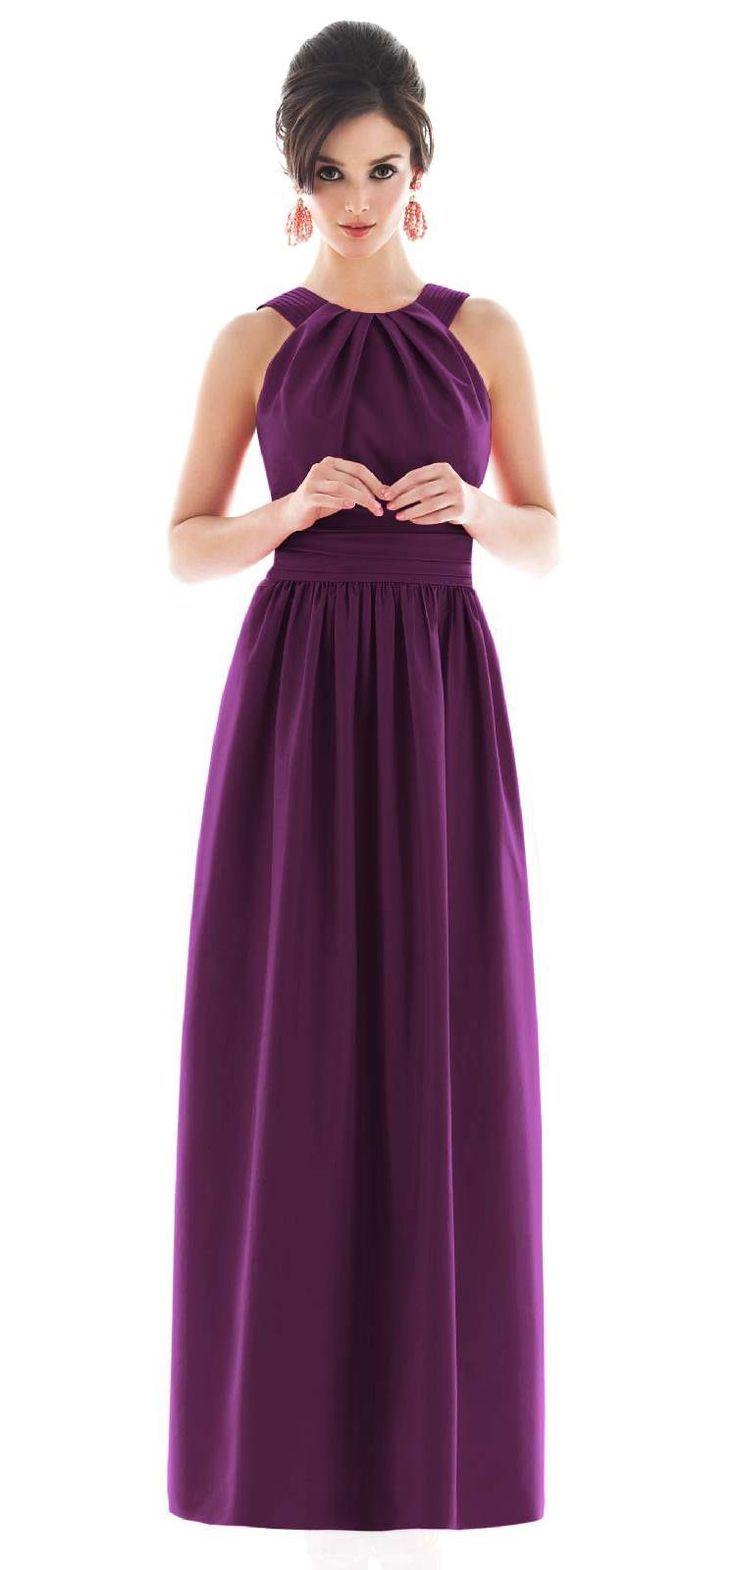 11 best bridesmaid images on Pinterest | Bridesmaids, Ballroom dress ...